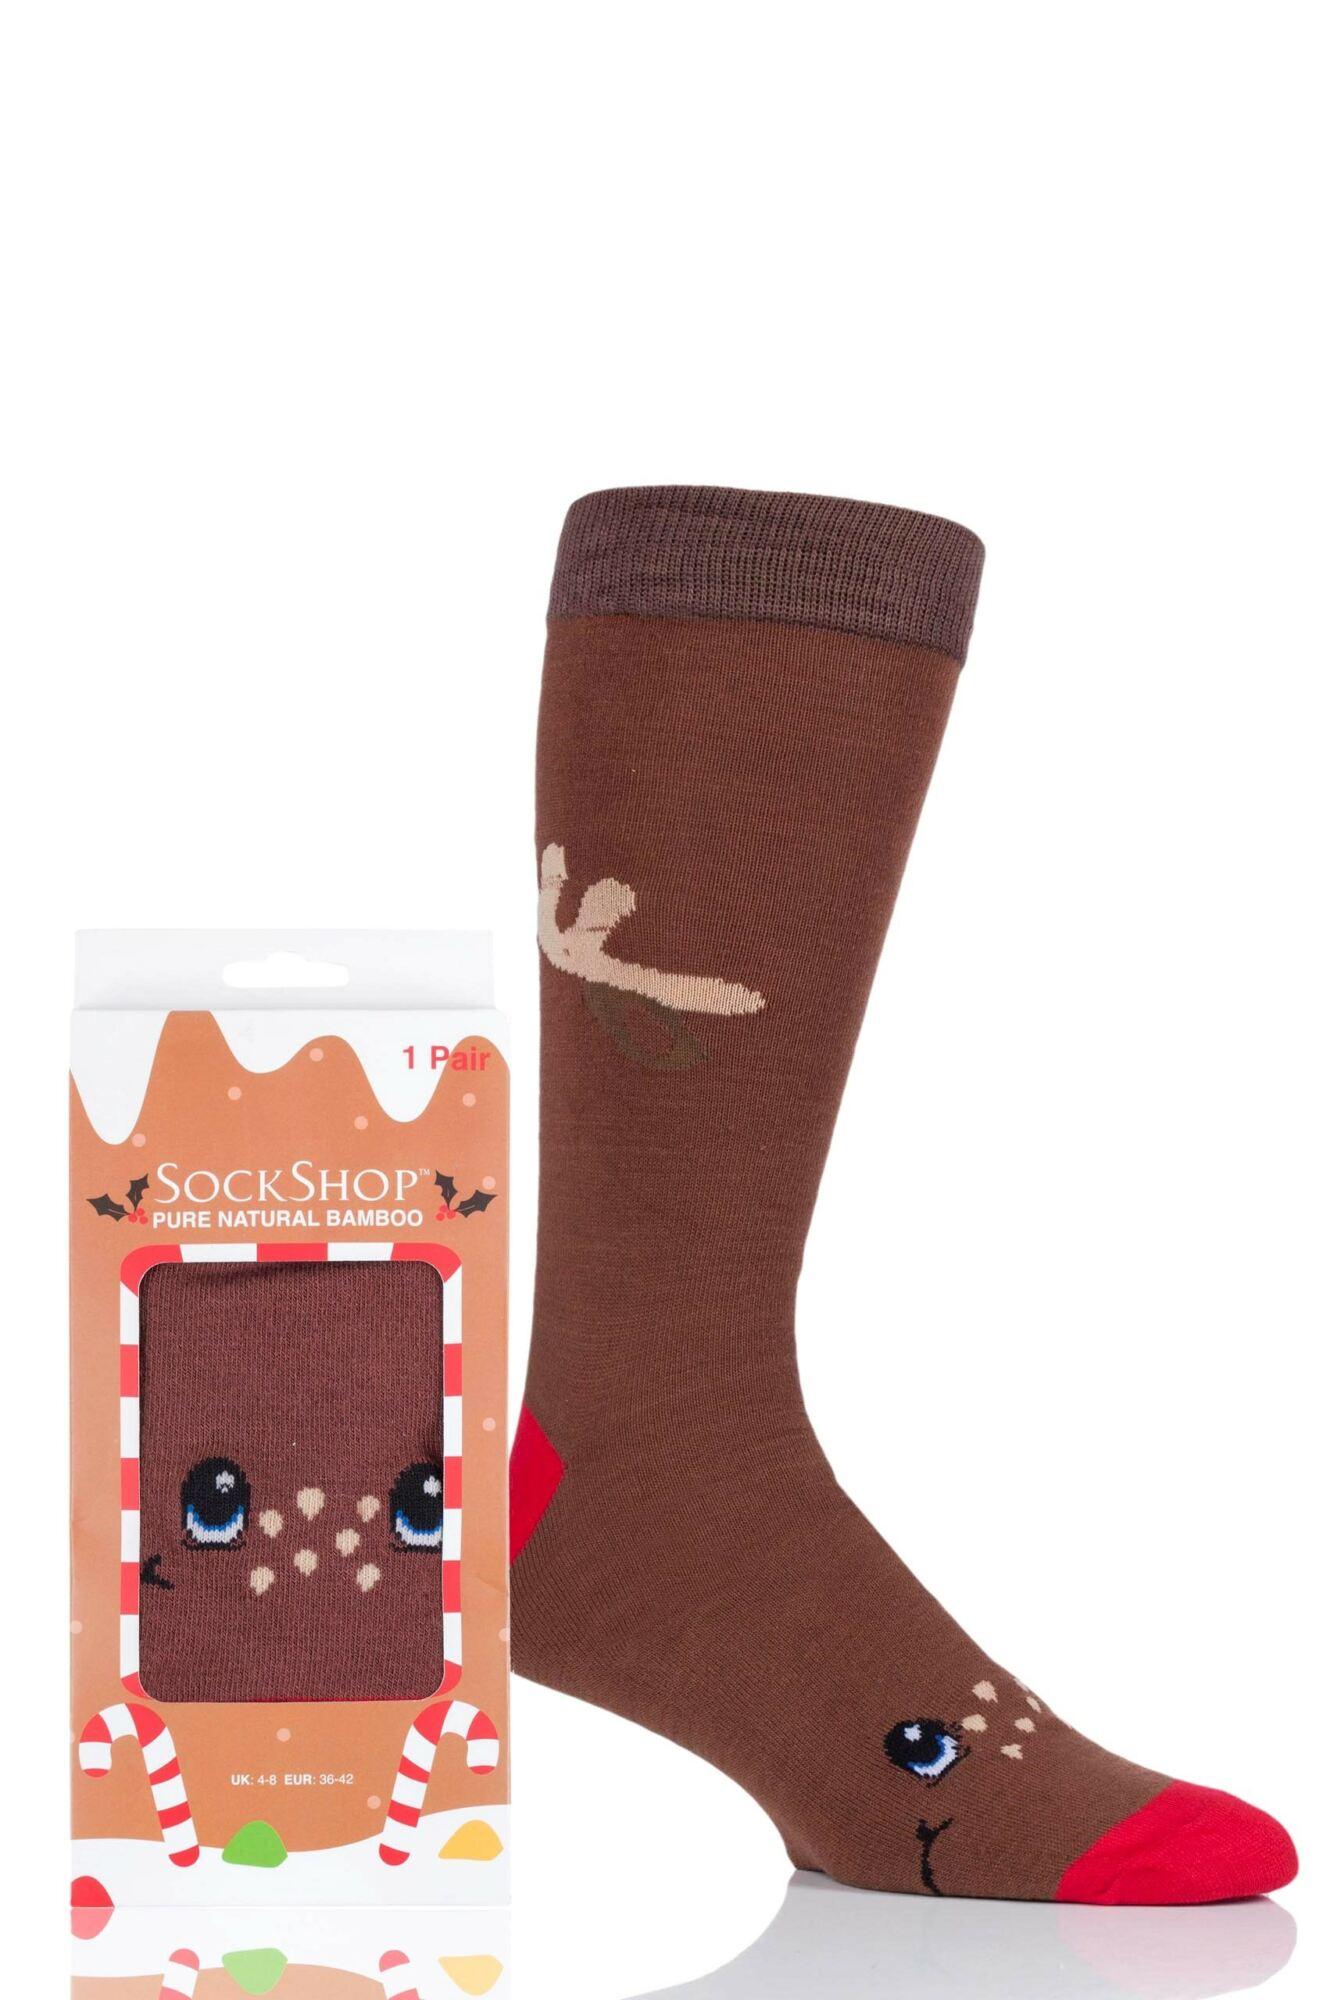 1 Pair Lazy Panda Bamboo Rudolph Christmas Gift Boxed Socks Unisex - SOCKSHOP